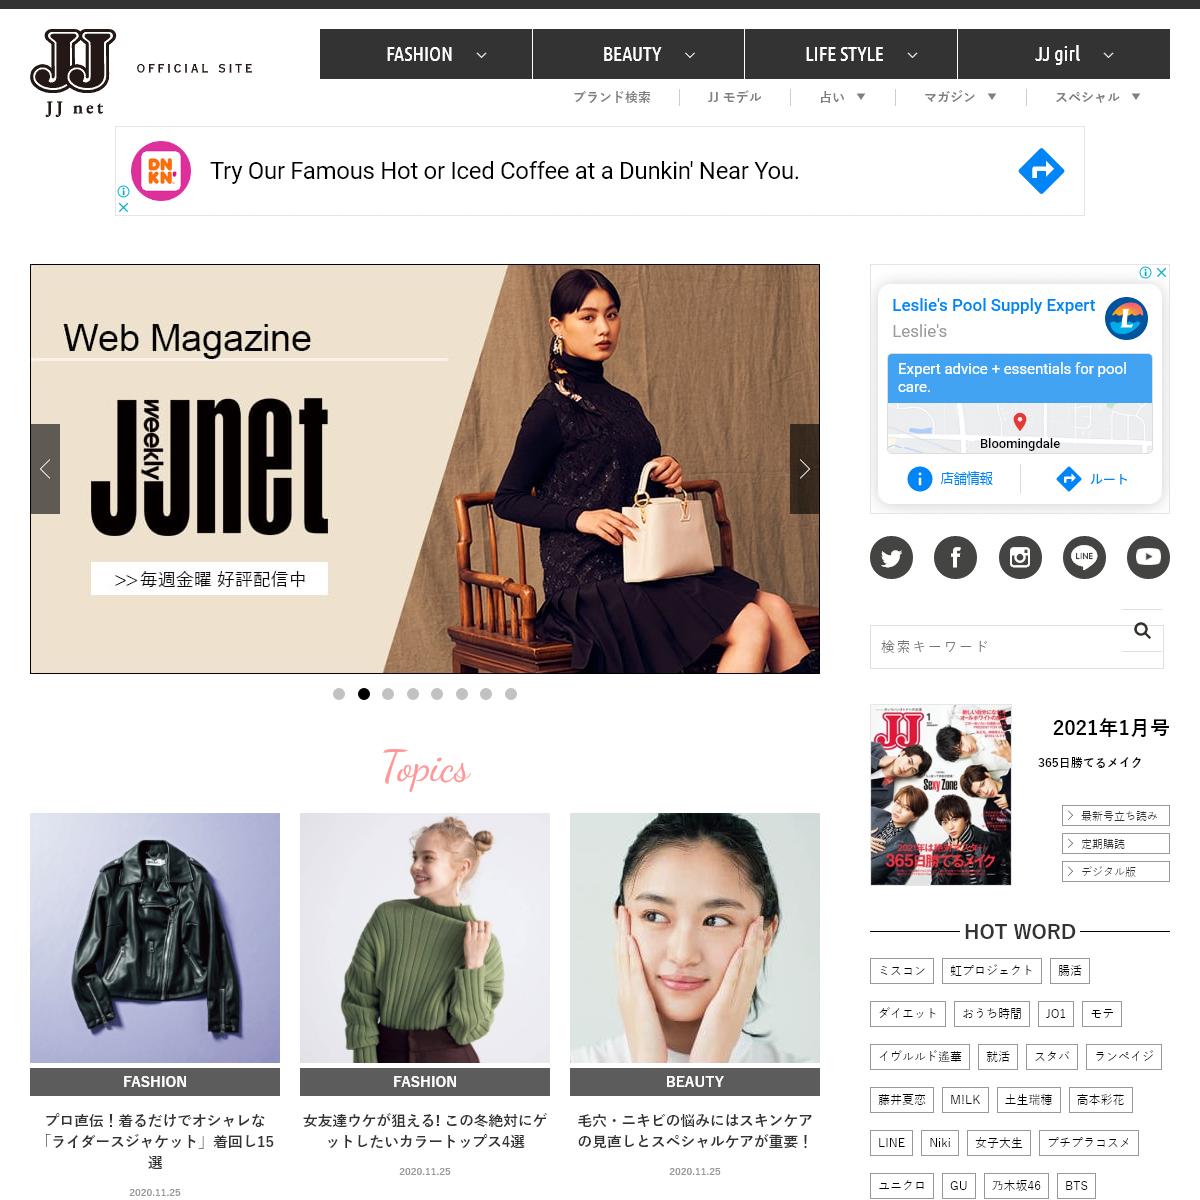 【JJ】 ファッション、ビューティ、ライフスタイルの最新情報|JJnet